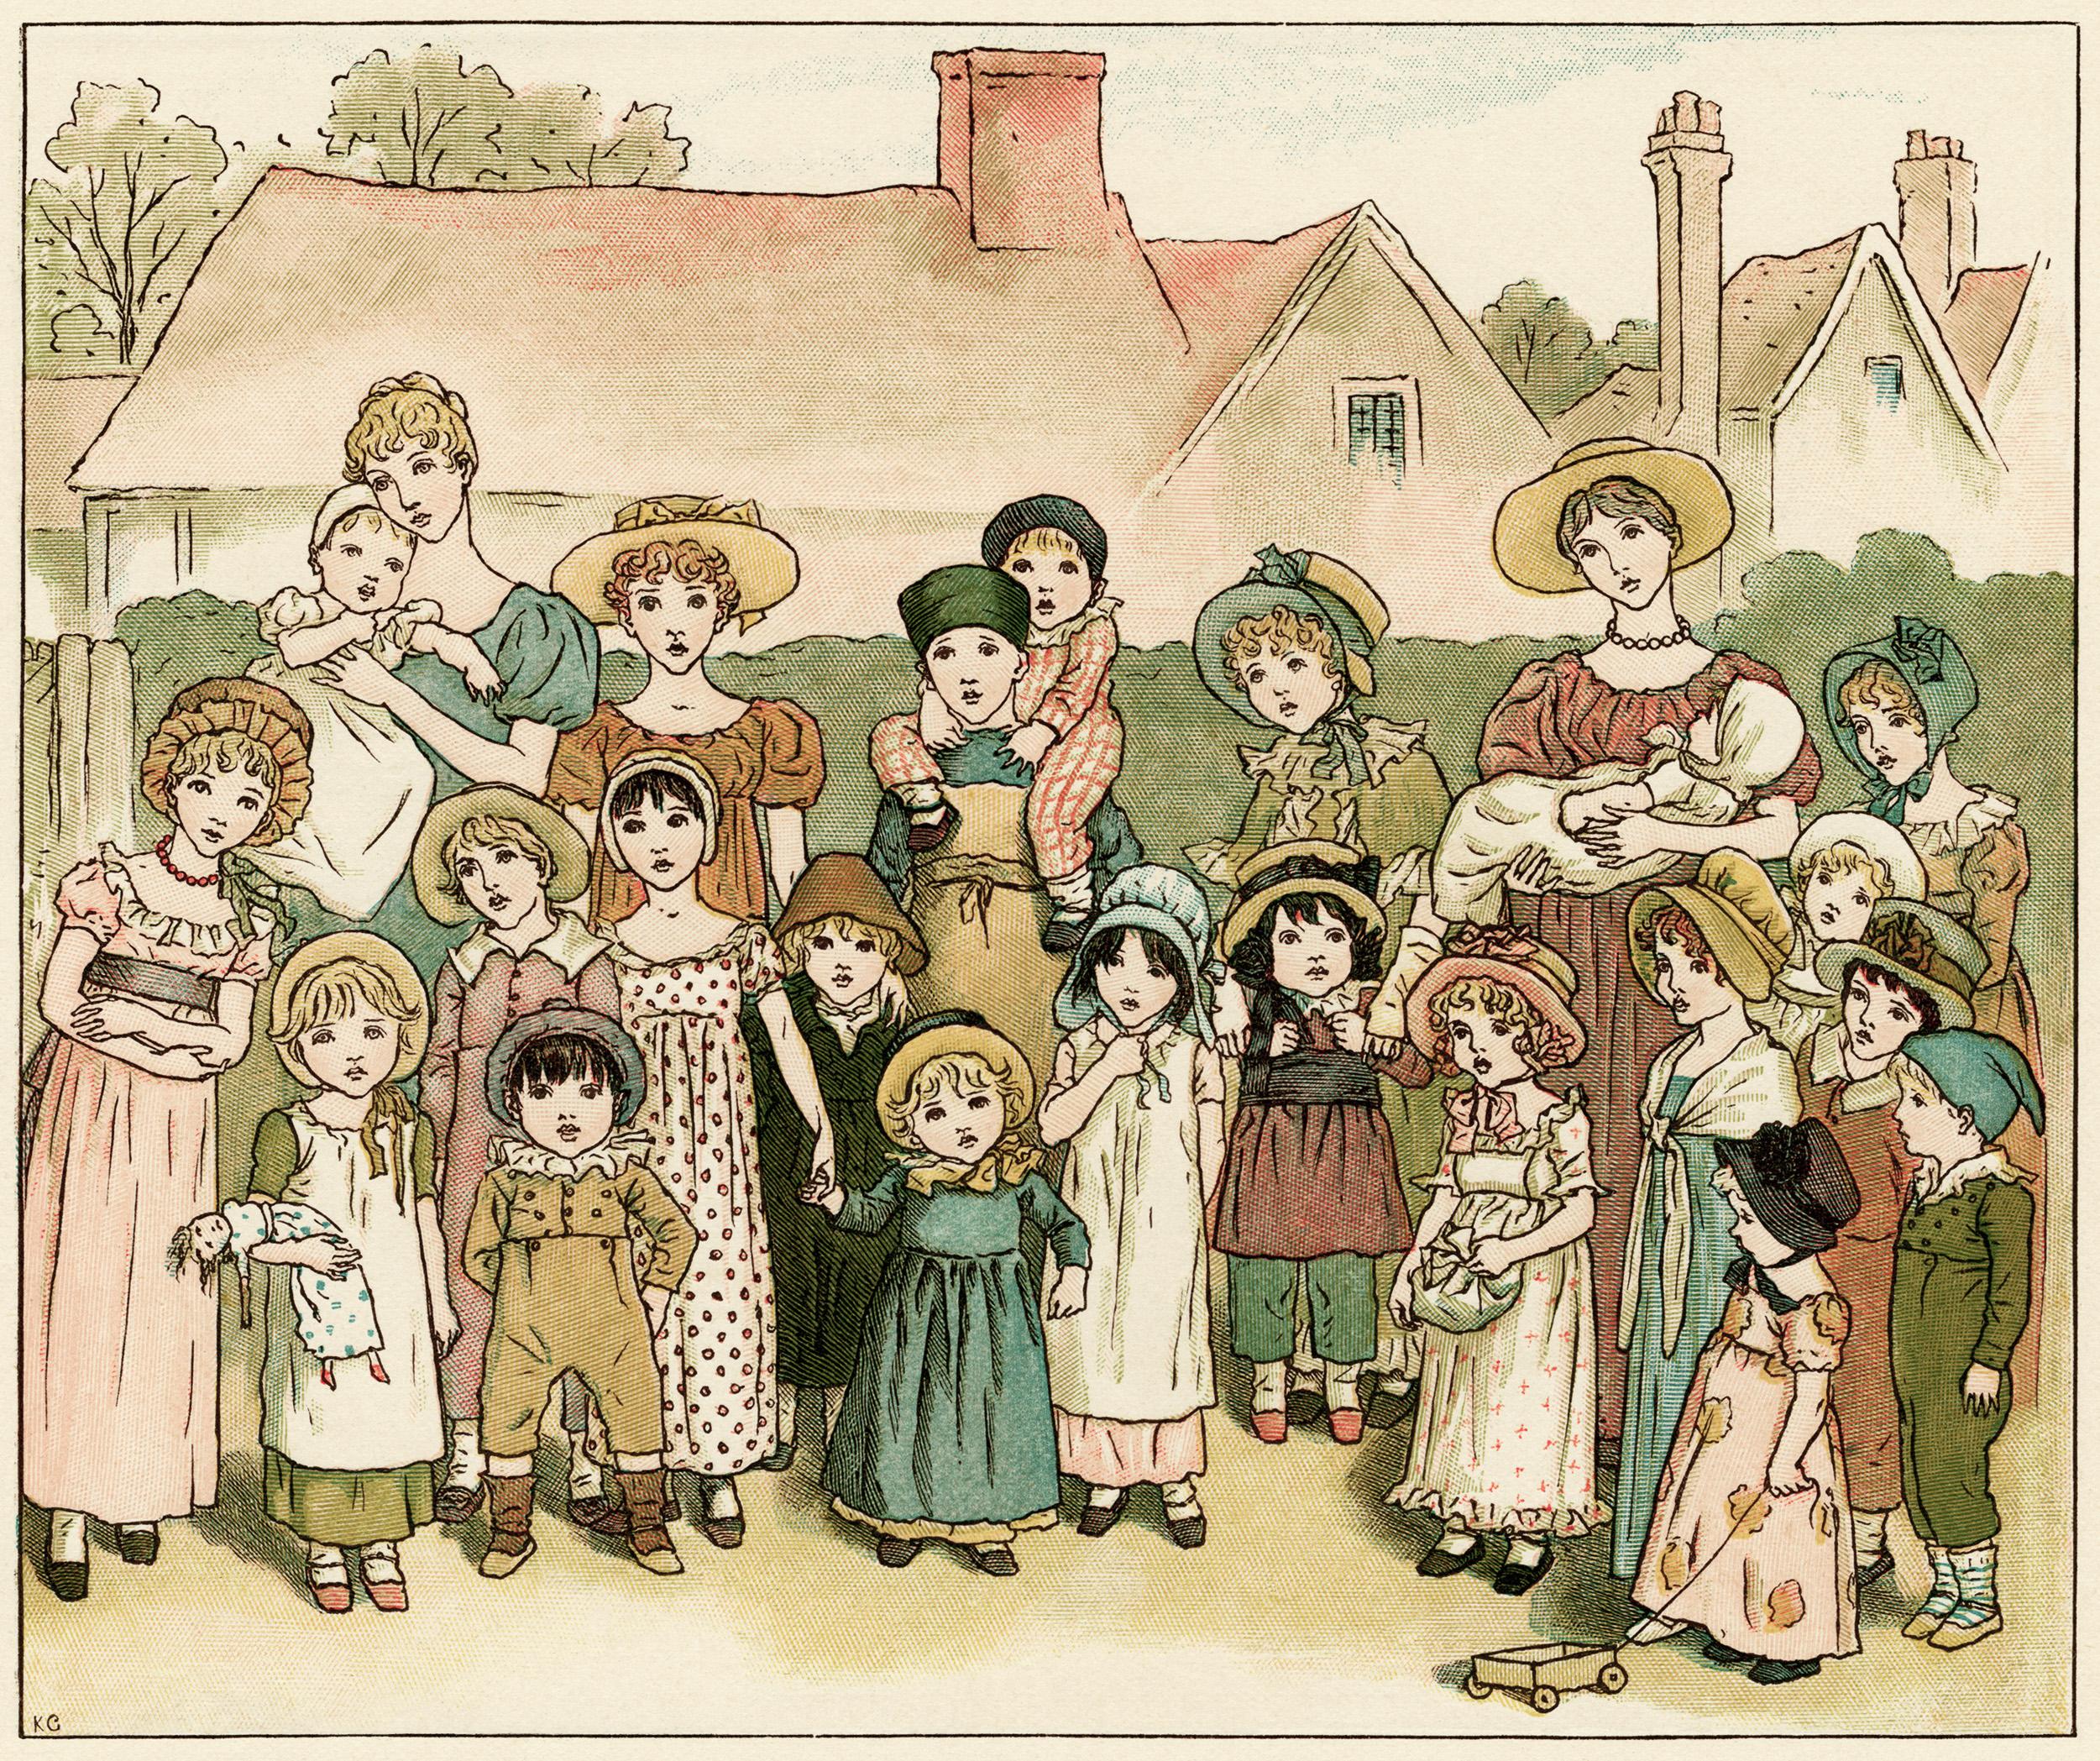 Kate Greenaway, street show, vintage storybook image, children's printable, Victorian people story illustration